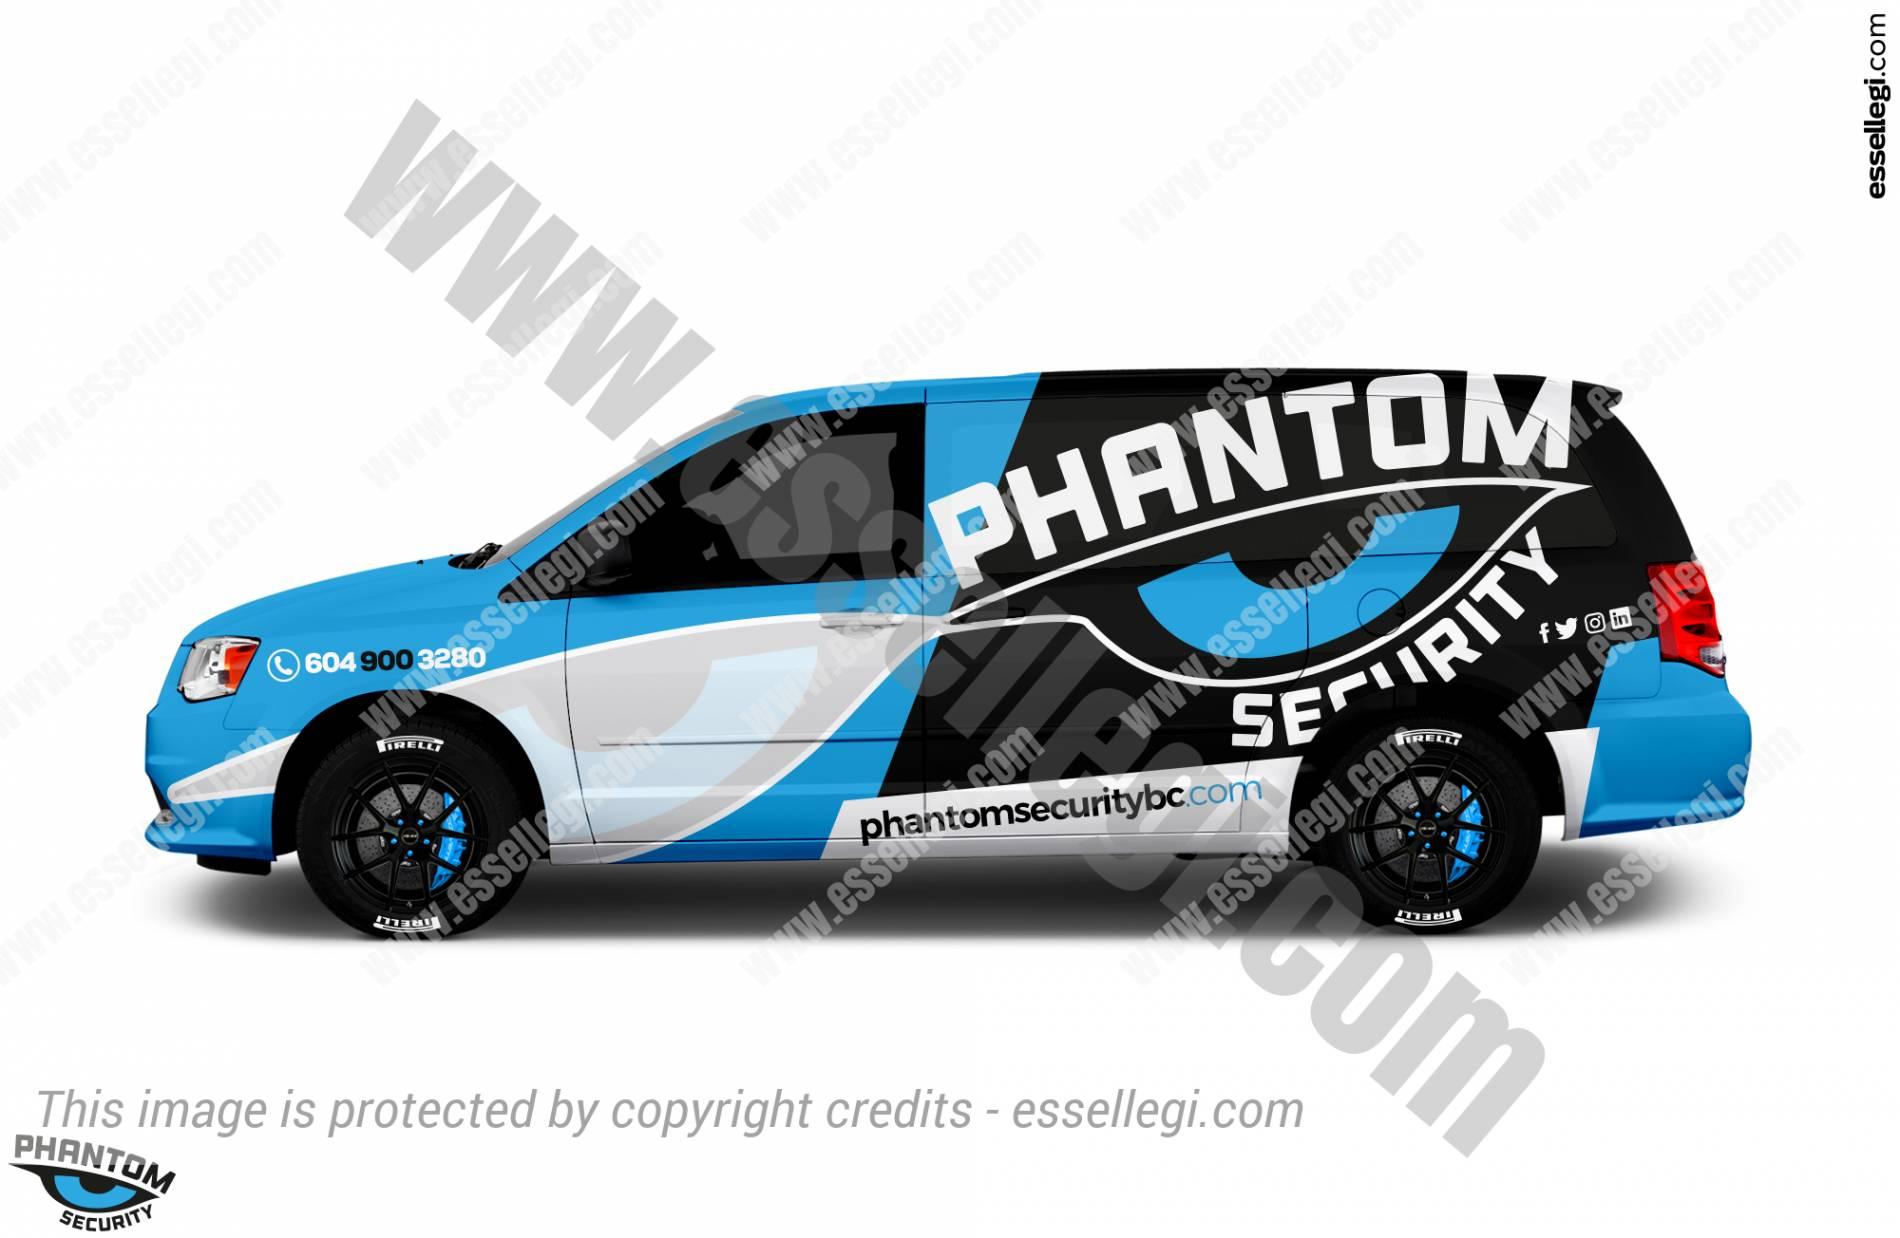 PHANTOM SECURITY | VAN WRAP DESIGN 🇨🇦